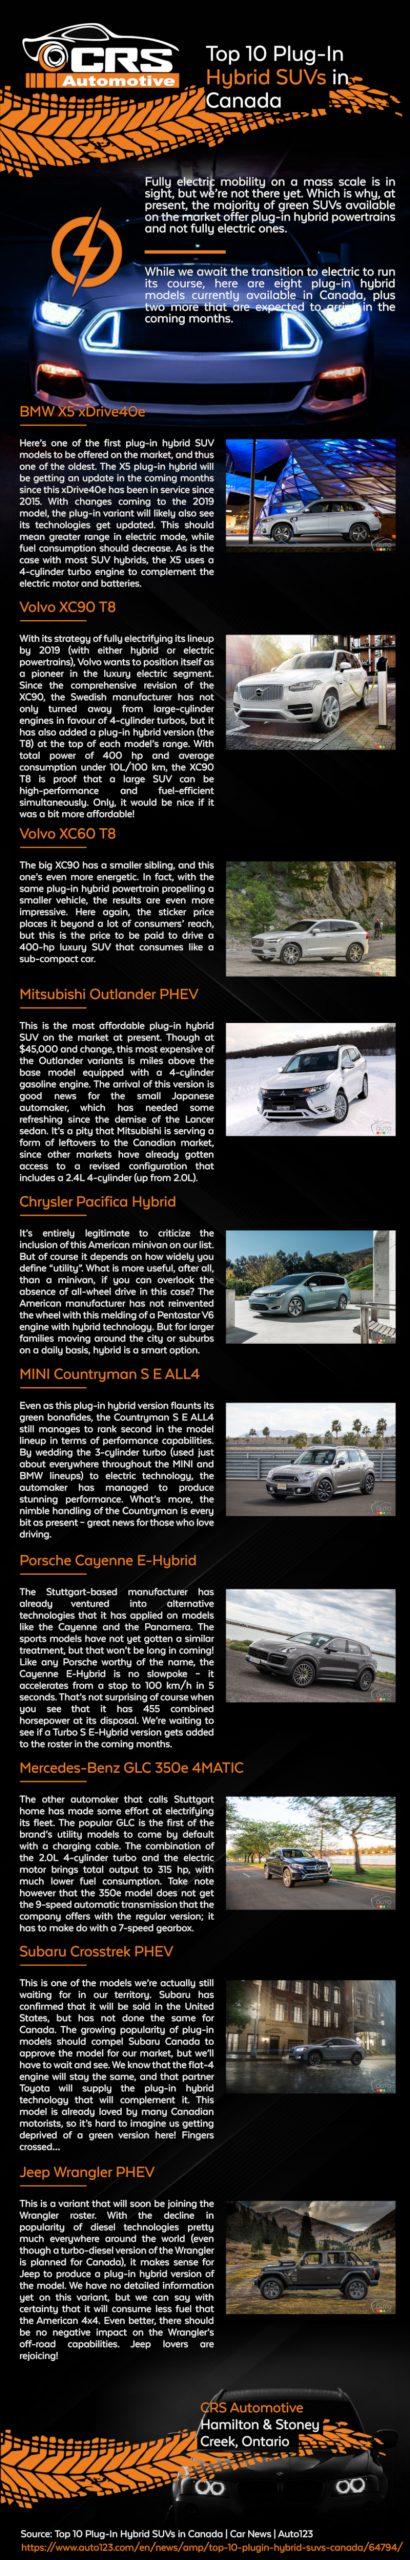 Top 10 Plug-In Hybrid SUVs in Canada-CRS Automotive